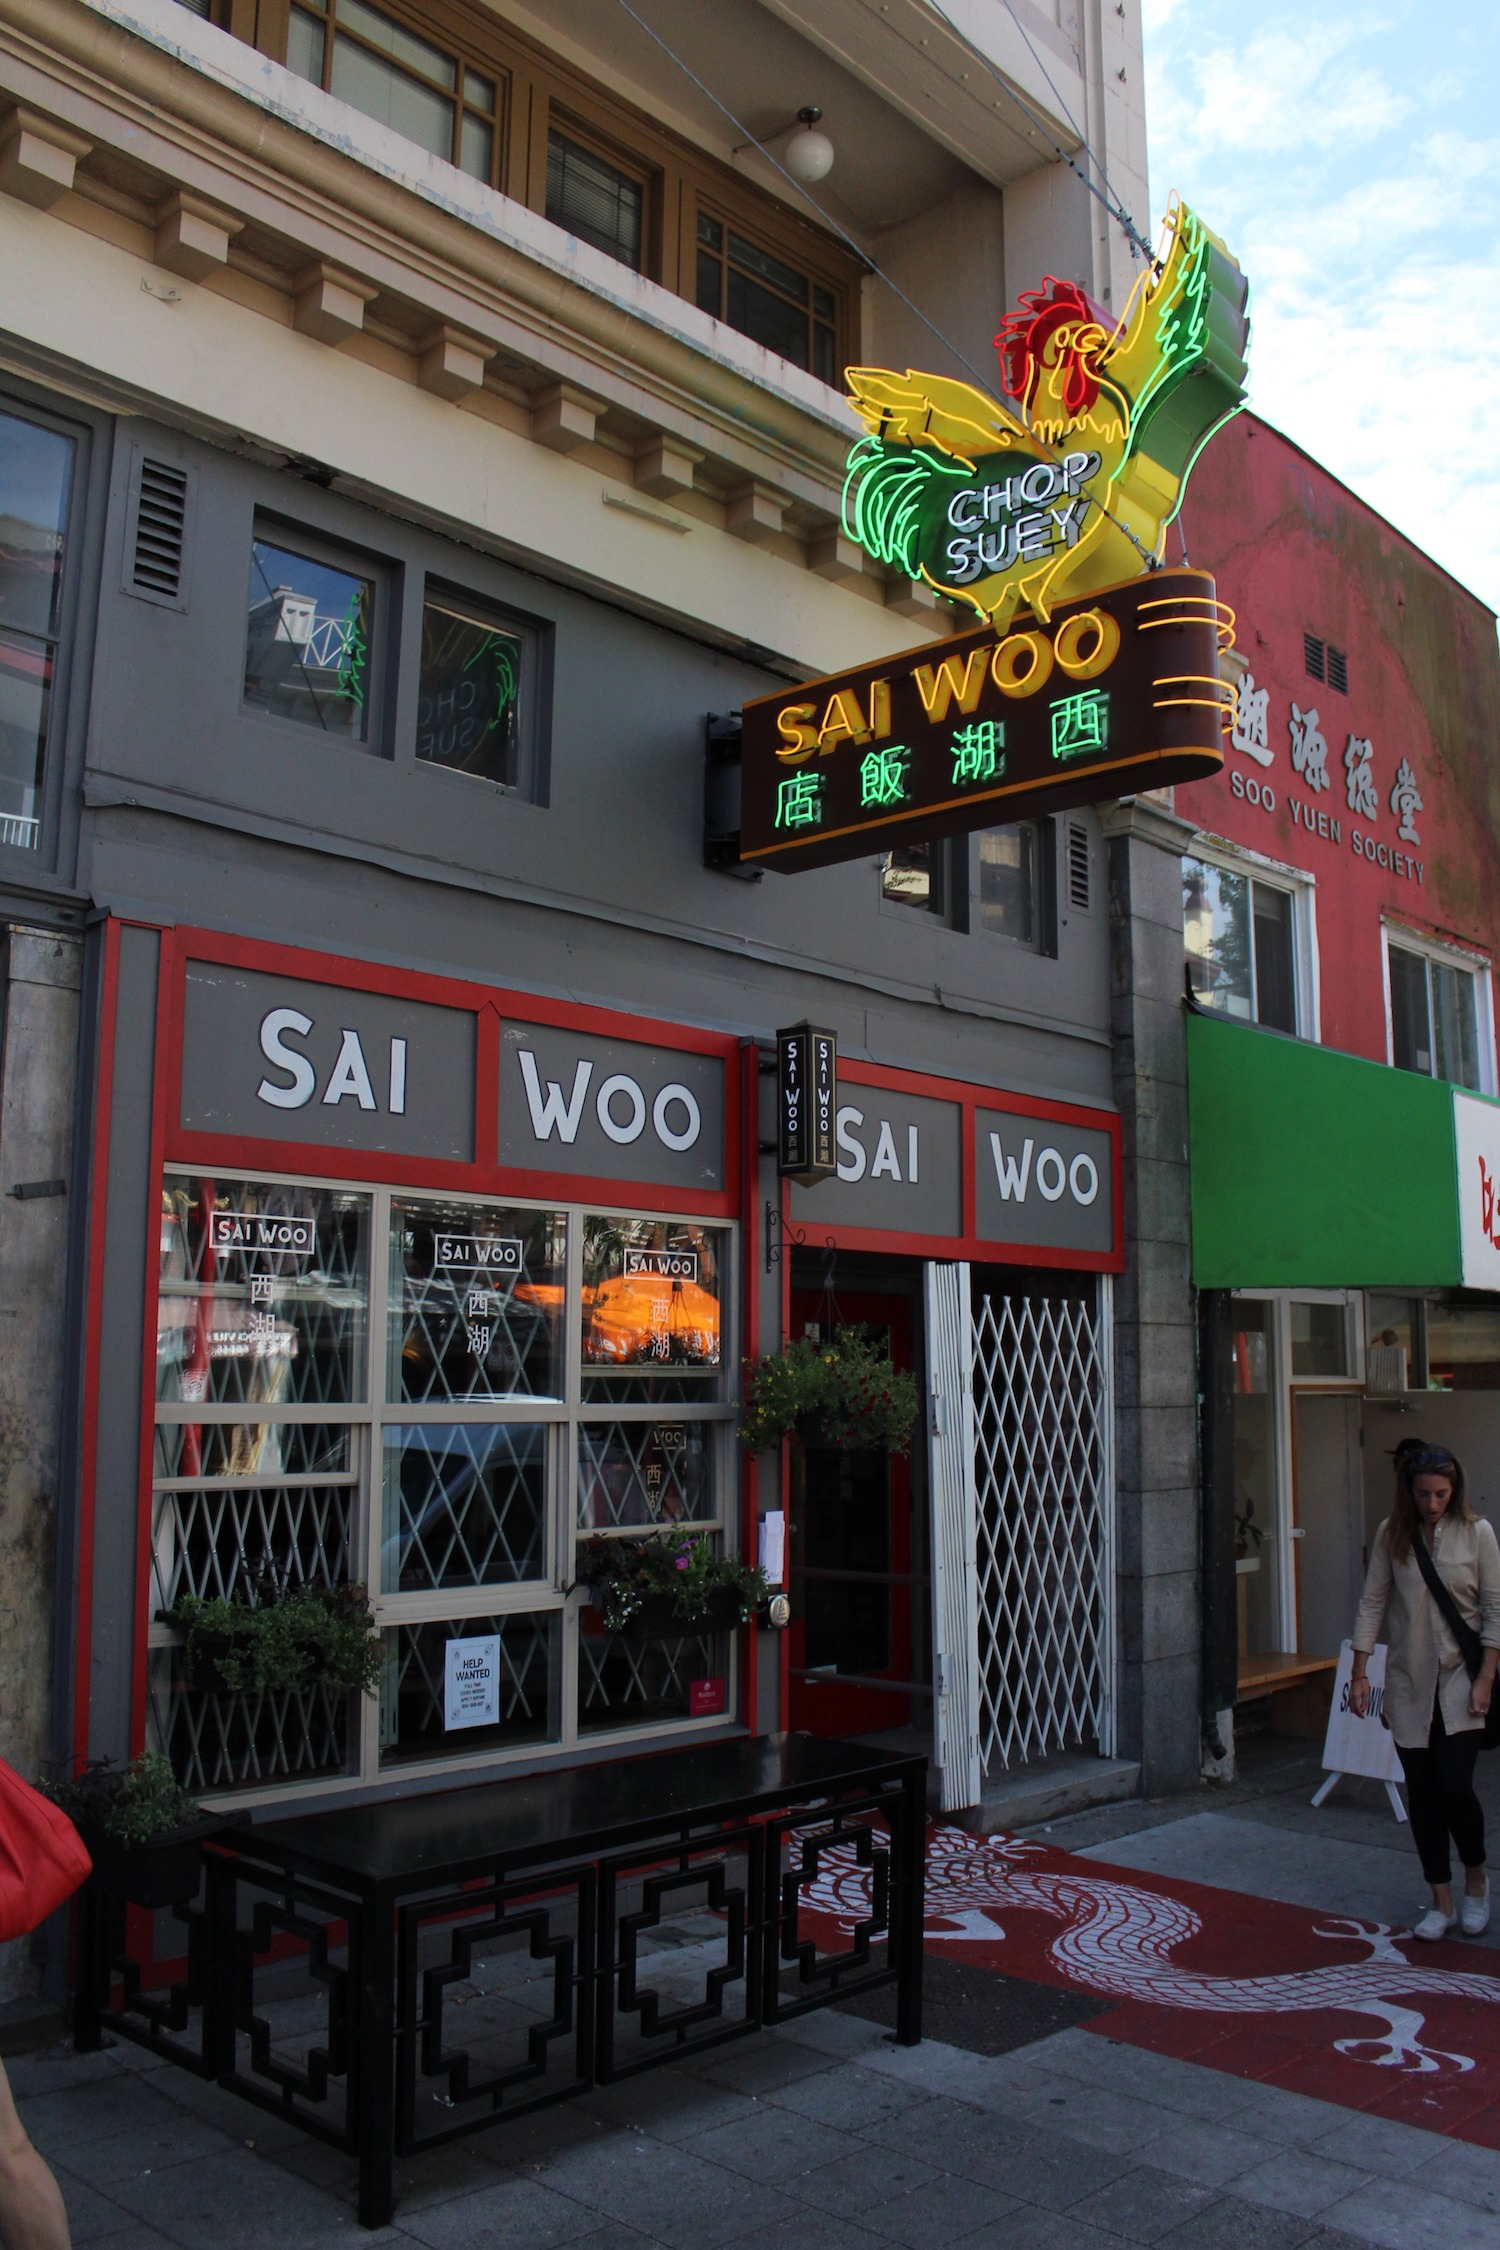 Sai Woo sits under the Chin Wing Chun Society building (Chandler Walter/Daily Hive)